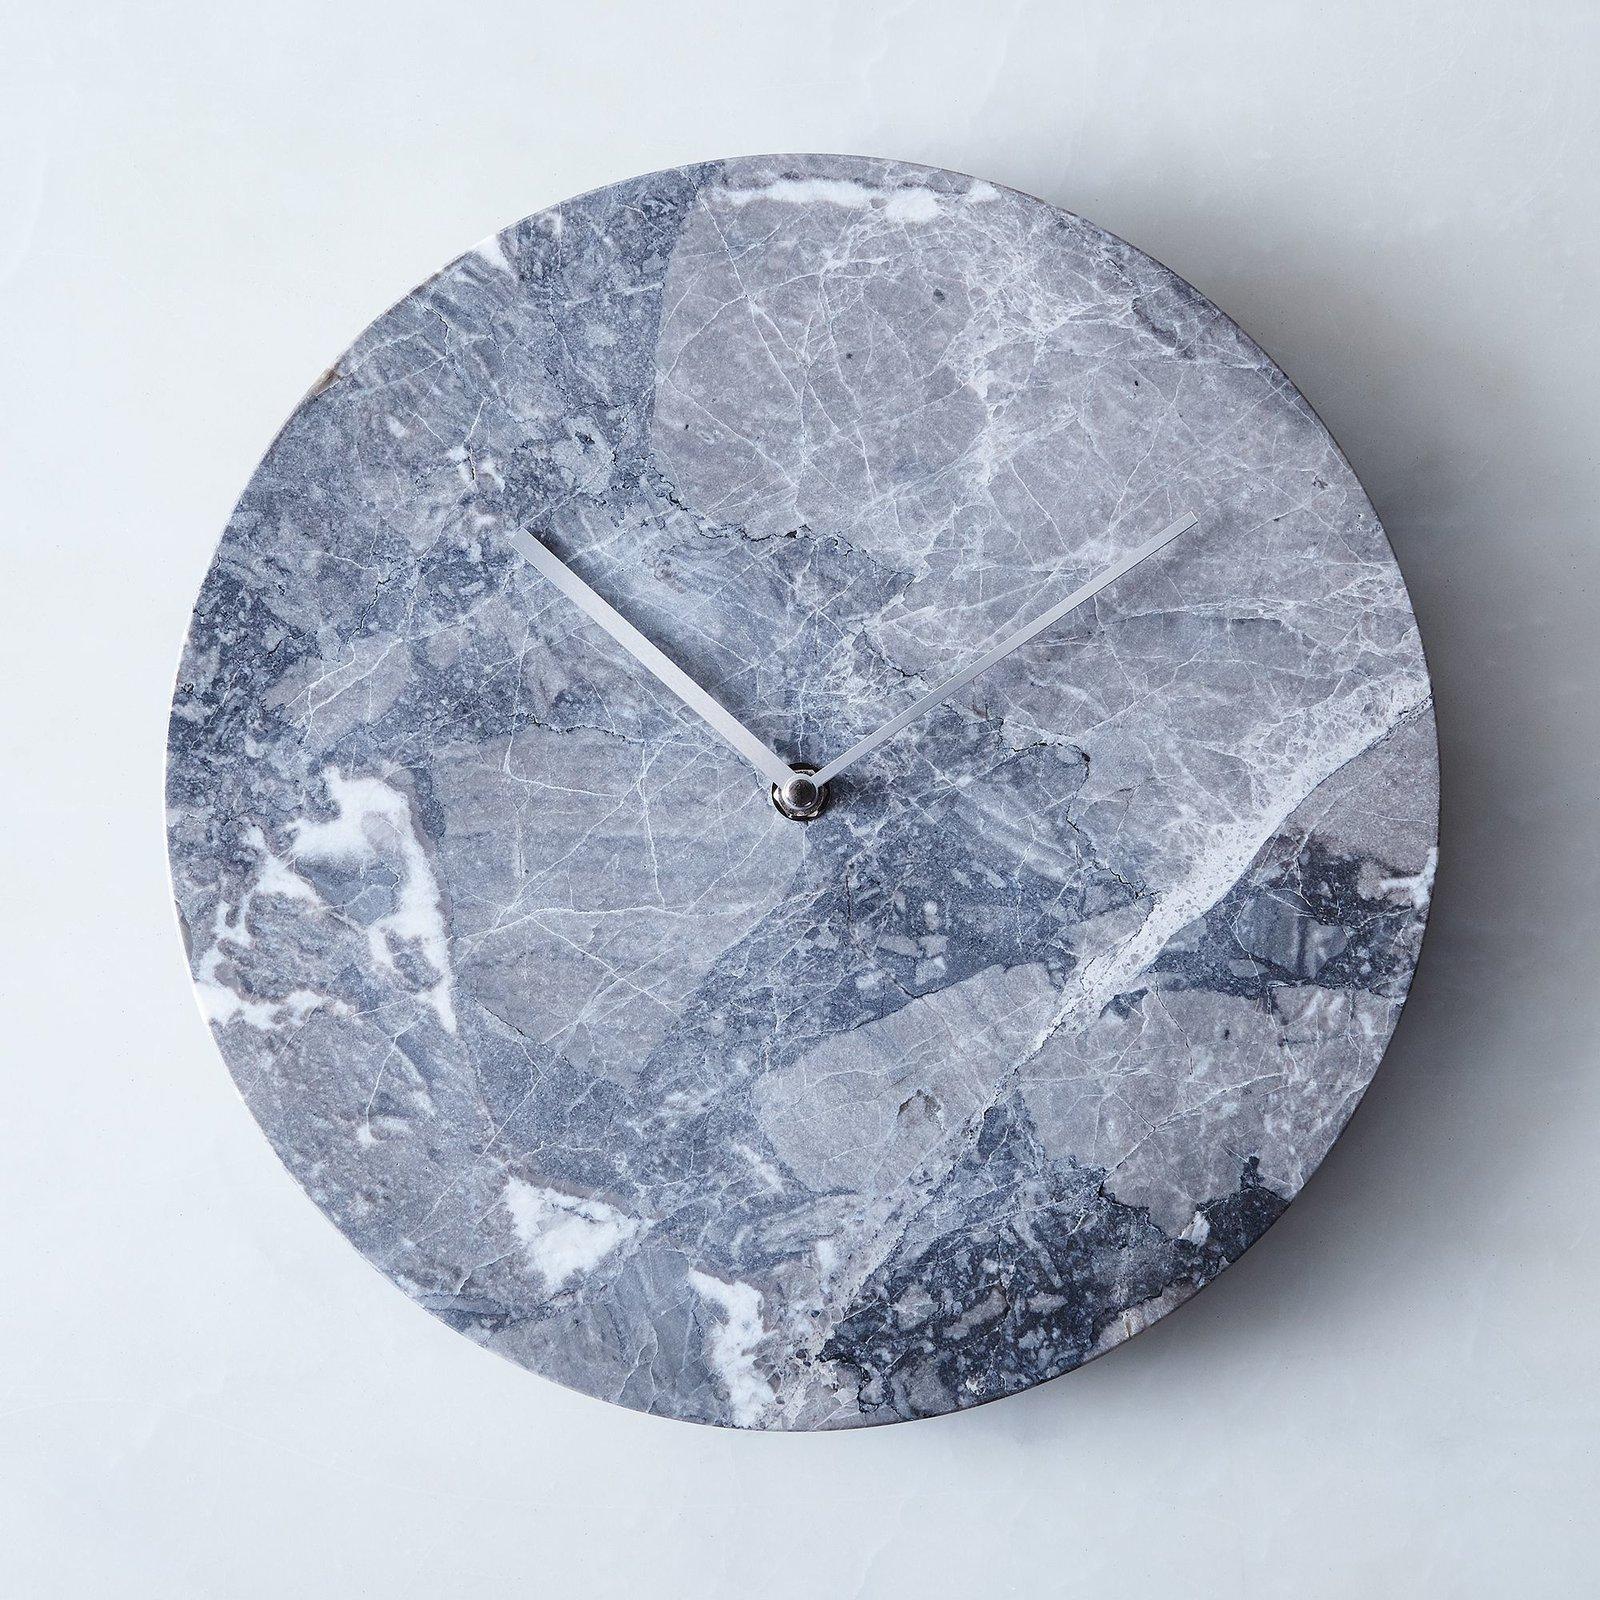 Photo 1 of 1 in Menu Grey Marble Wall Clock